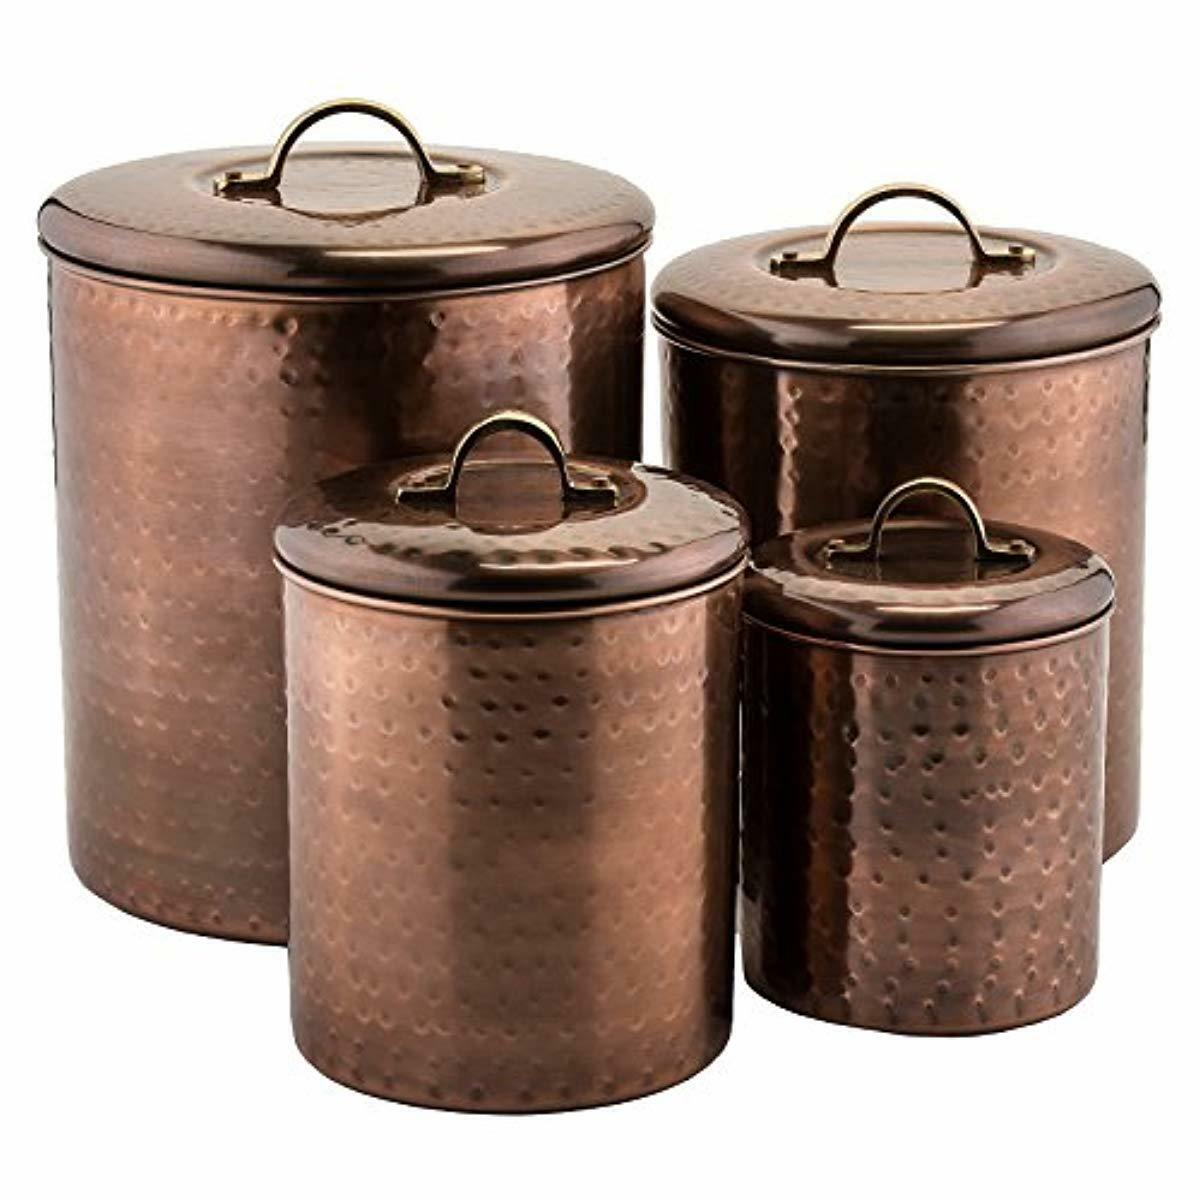 Old Dutch 4 Piece Hammered Canister Set, Antique Copper